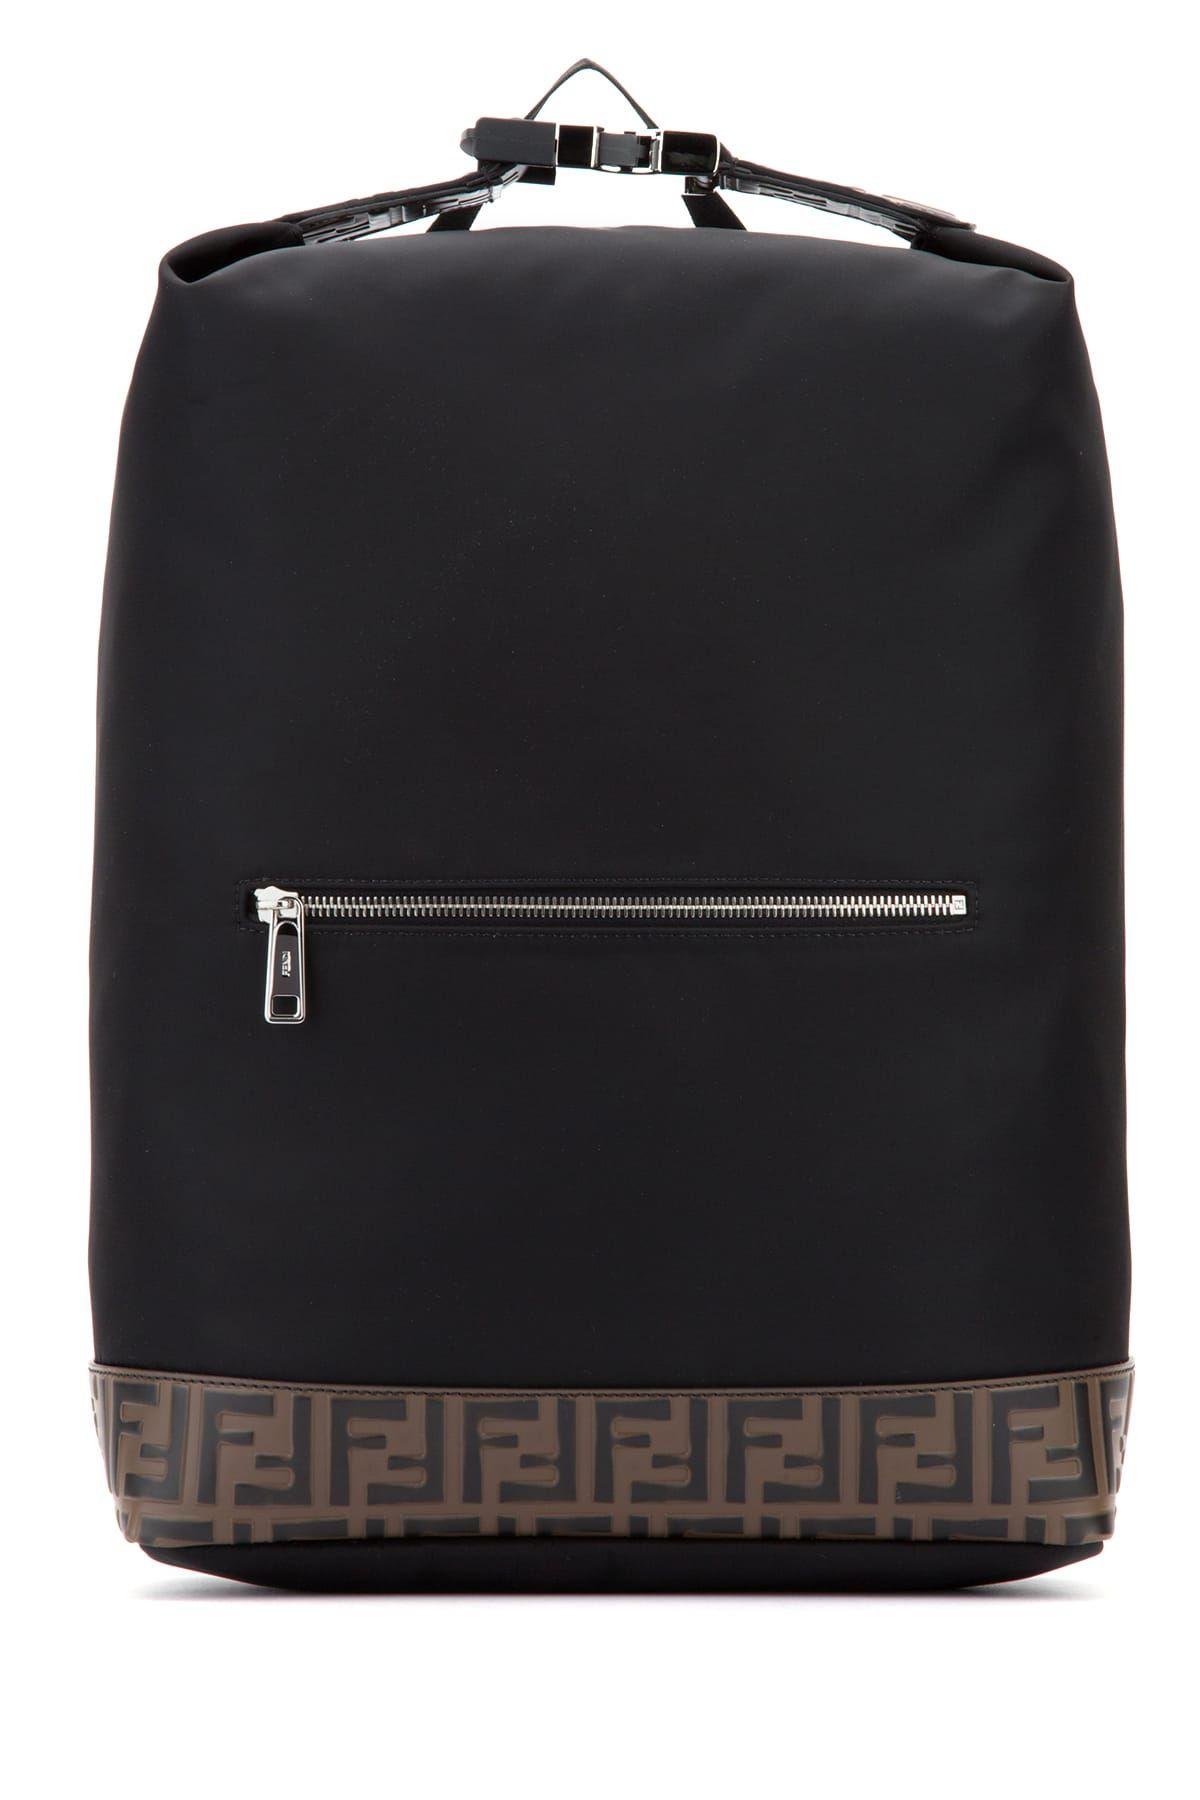 6875b987994e FENDI FF细节背包.  fendi  bags  leather  nylon  backpacks